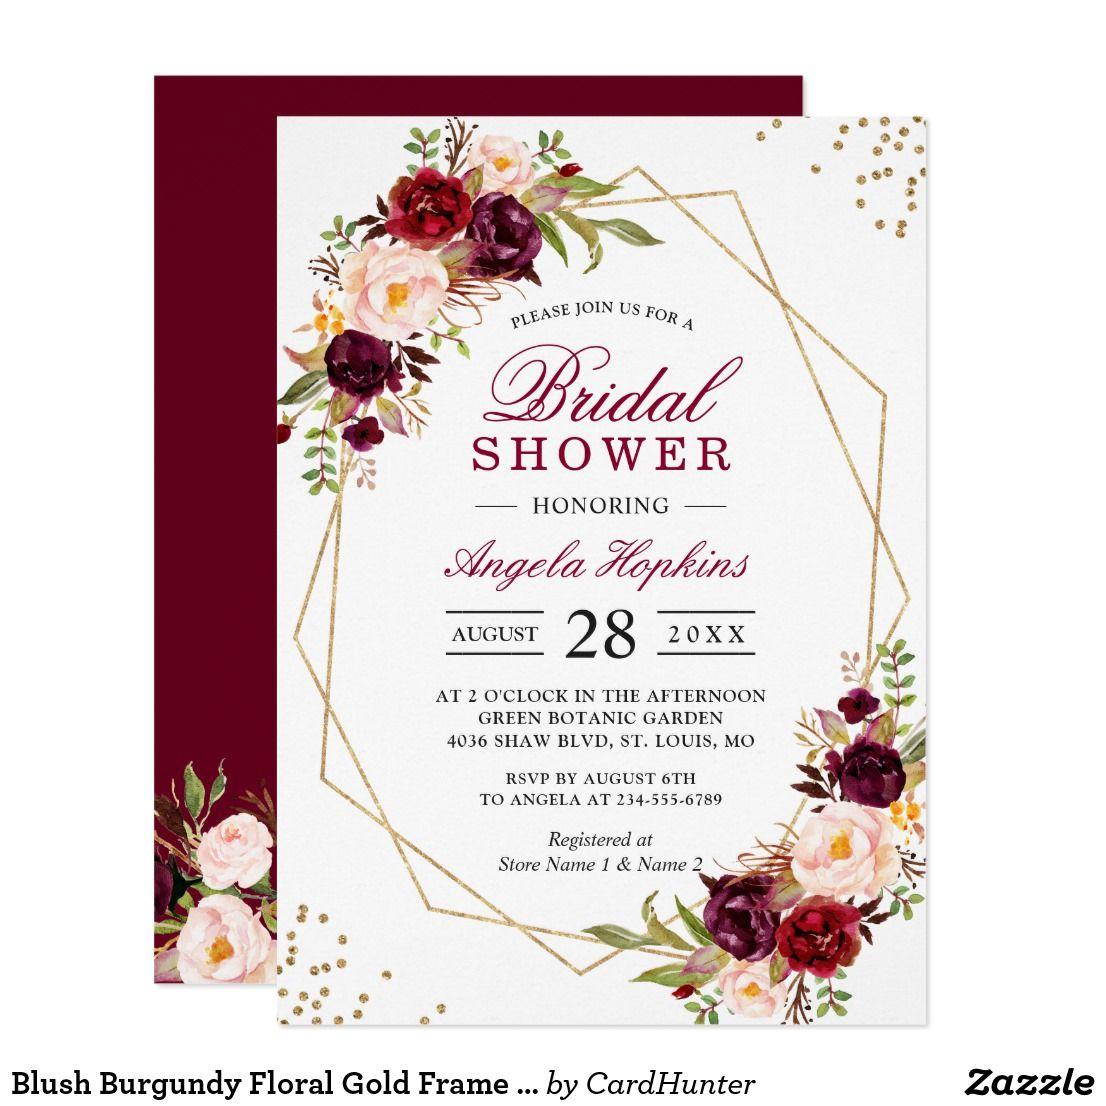 Blush Burgundy Floral Gold Frame Bridal Shower Invitation Zazzle Com Wedding Frames Geometric Wedding Invitation Floral Wedding Invitations